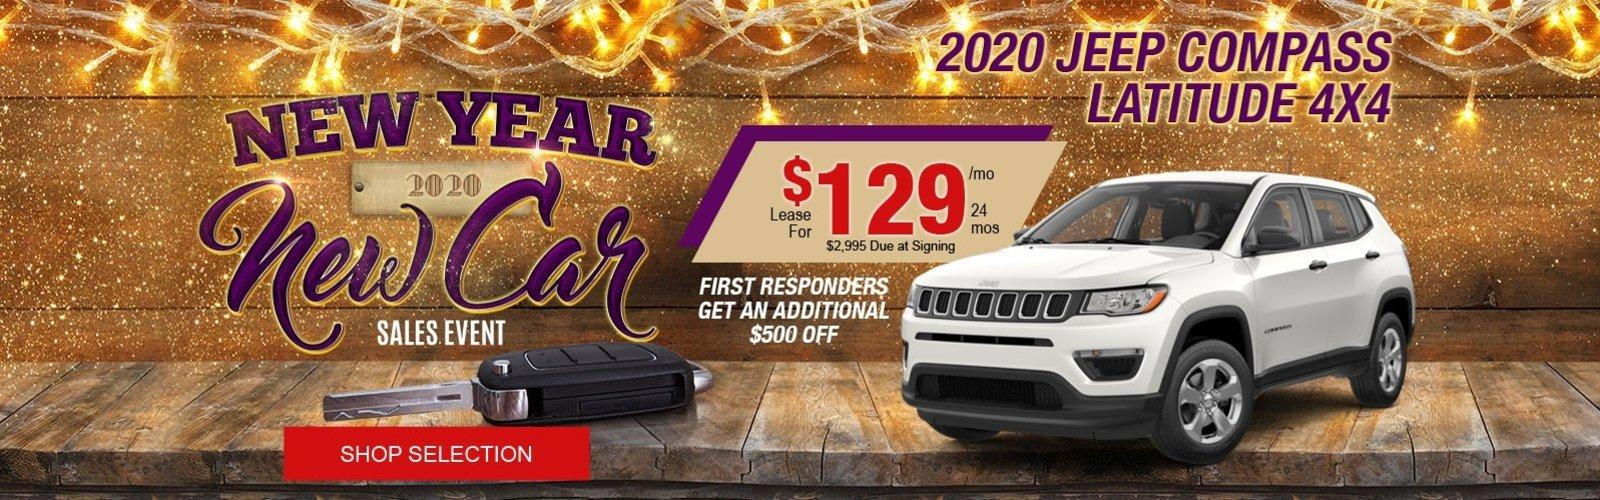 Island Chrysler Dodge >> Full Service Chrysler Dodge Jeep Ram Dealership In The Bronx